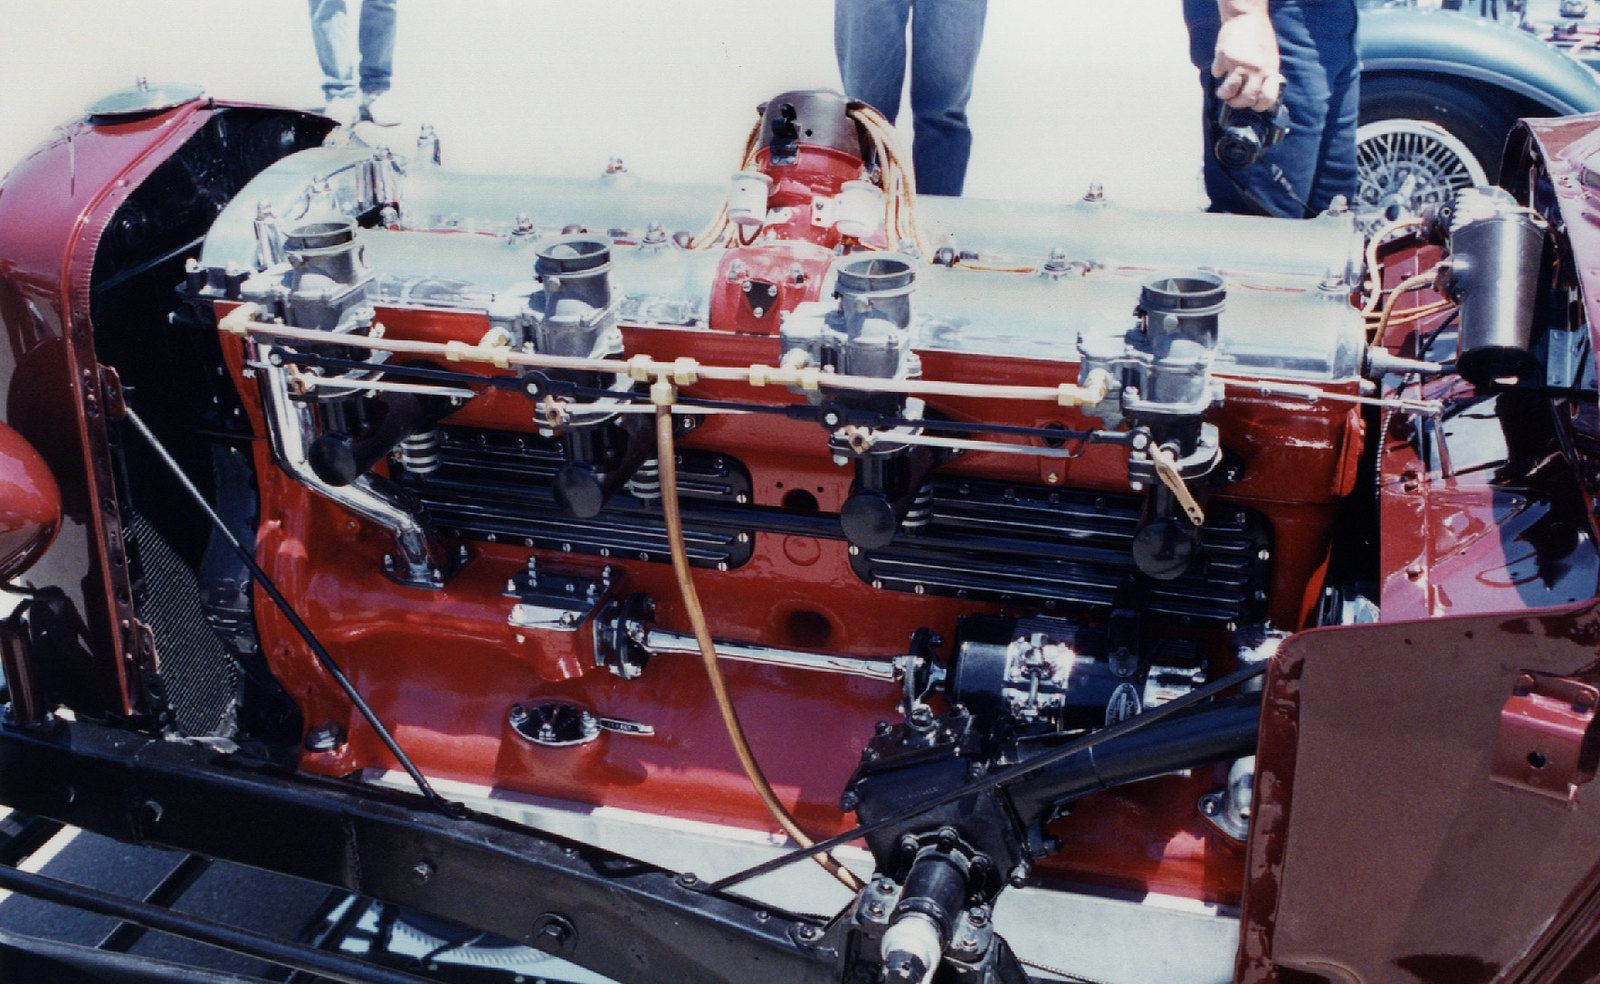 Hot Rod Duesey | Big Duesenberg straight eight cylinder engi… | Flickr